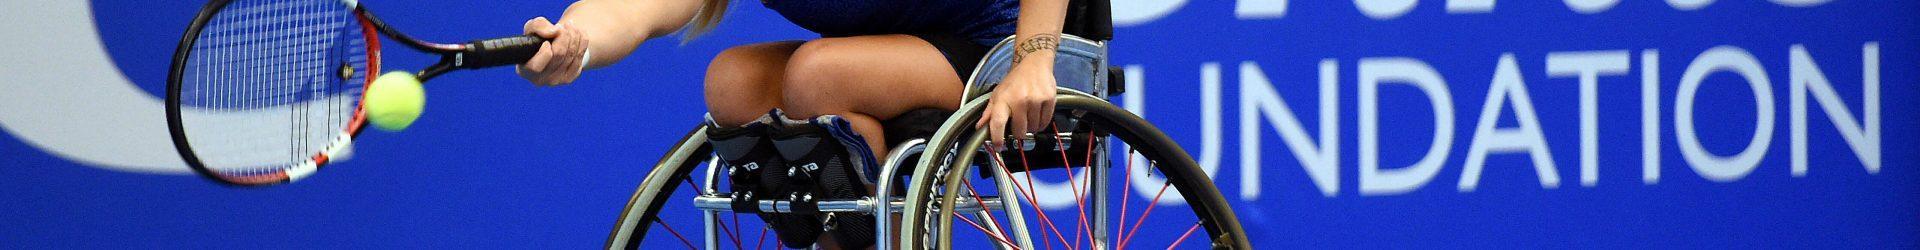 Chaotic Moon разрабатывает фитнес-трекер для инвалидов